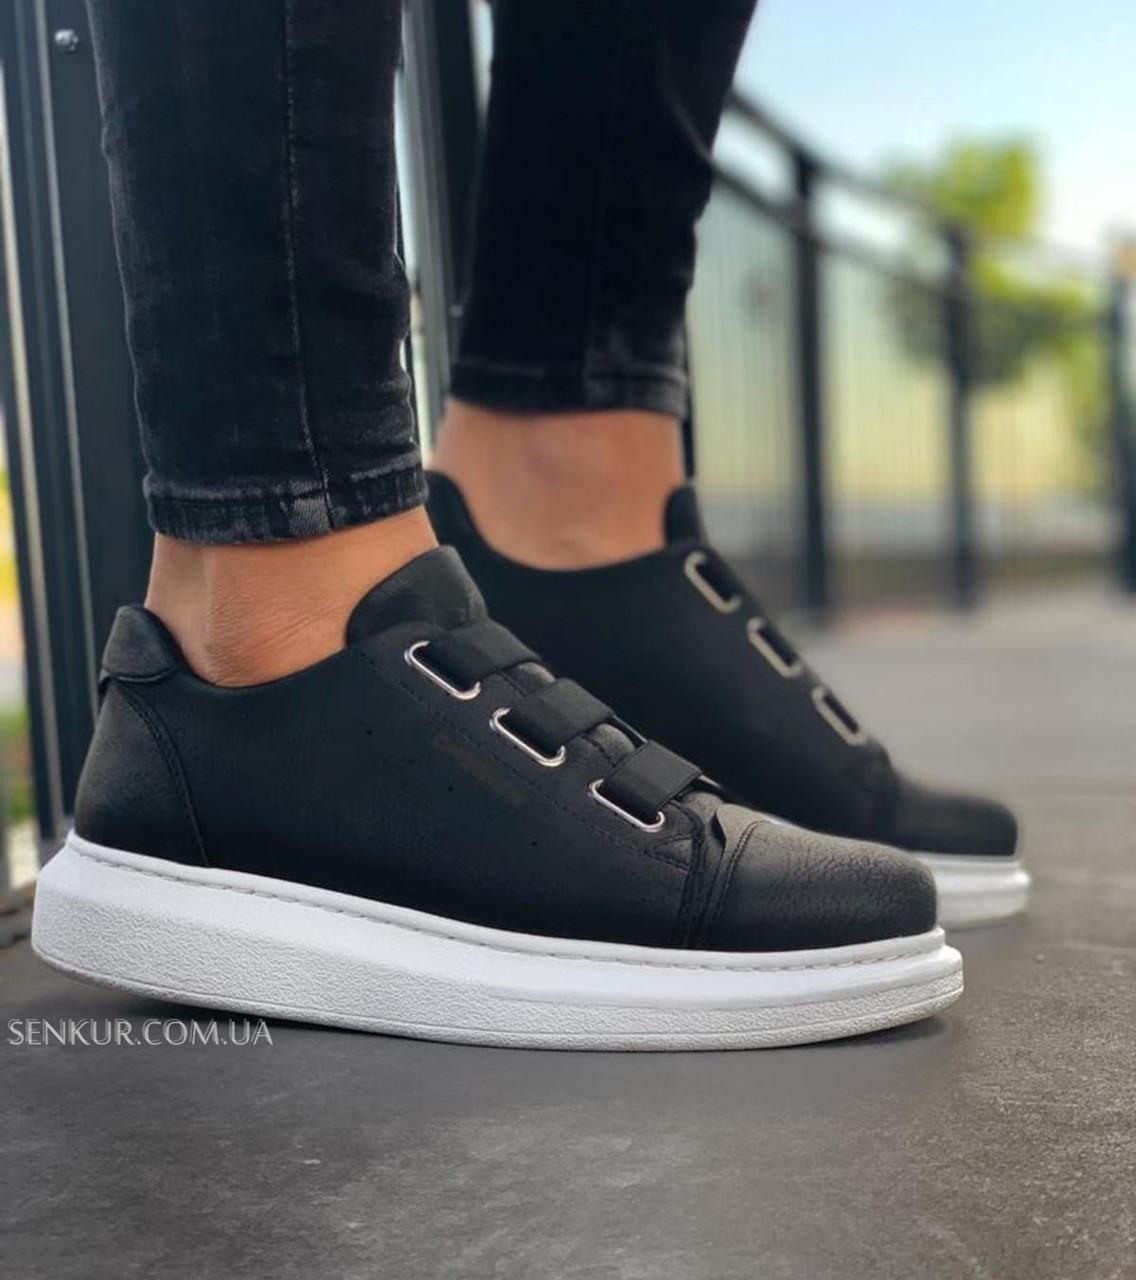 Чоловічі кросівки Chekich CH253 Black/White